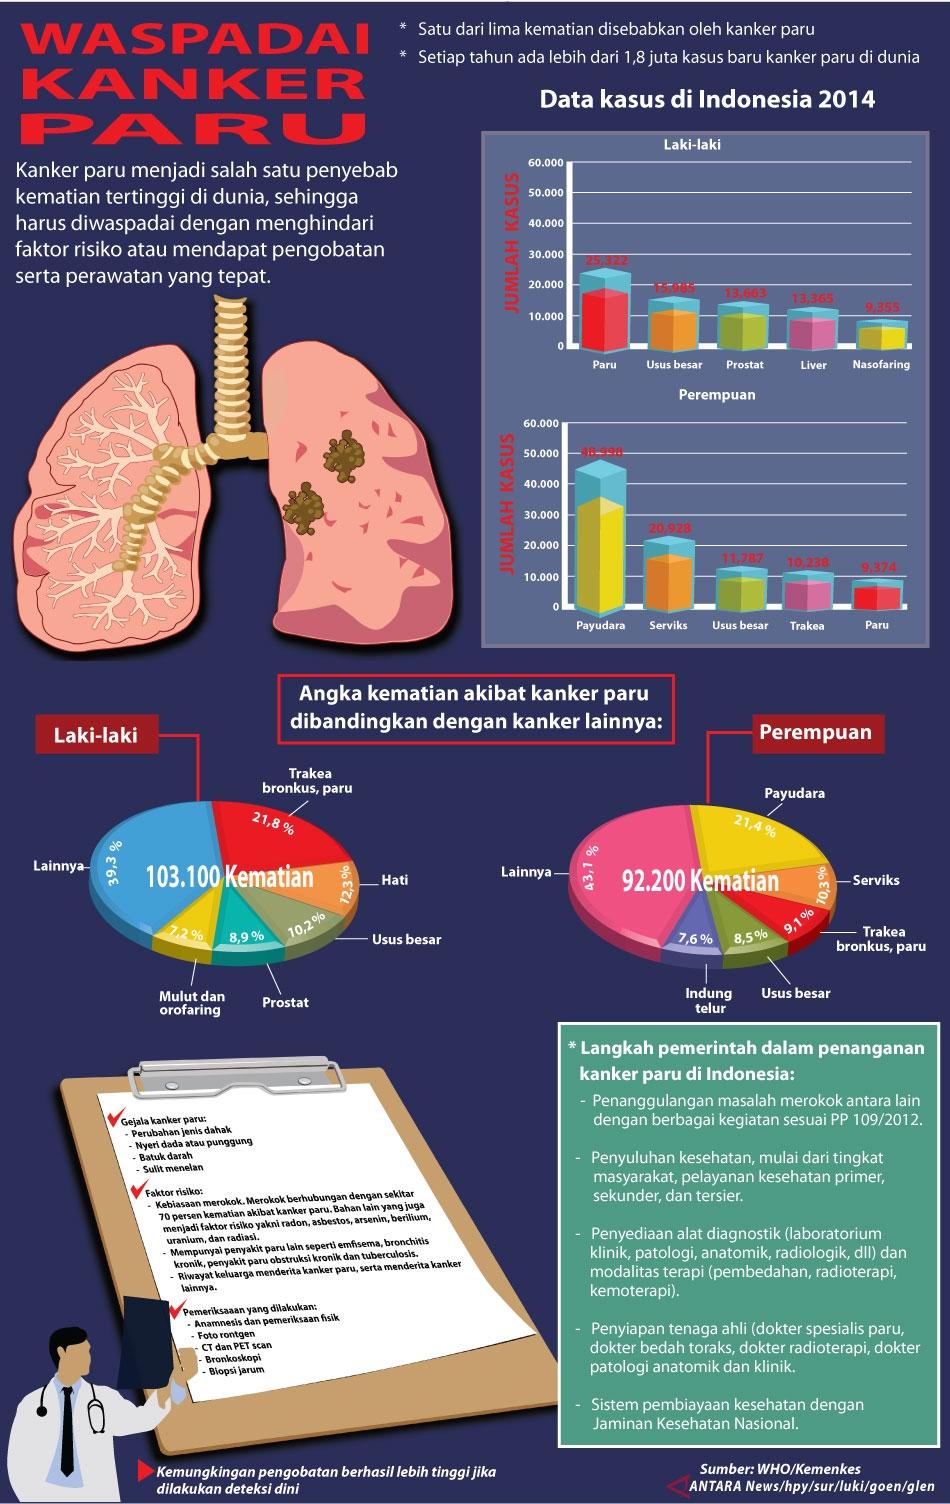 Waspadai Kanker Paru - Info Grafis ANTARA News